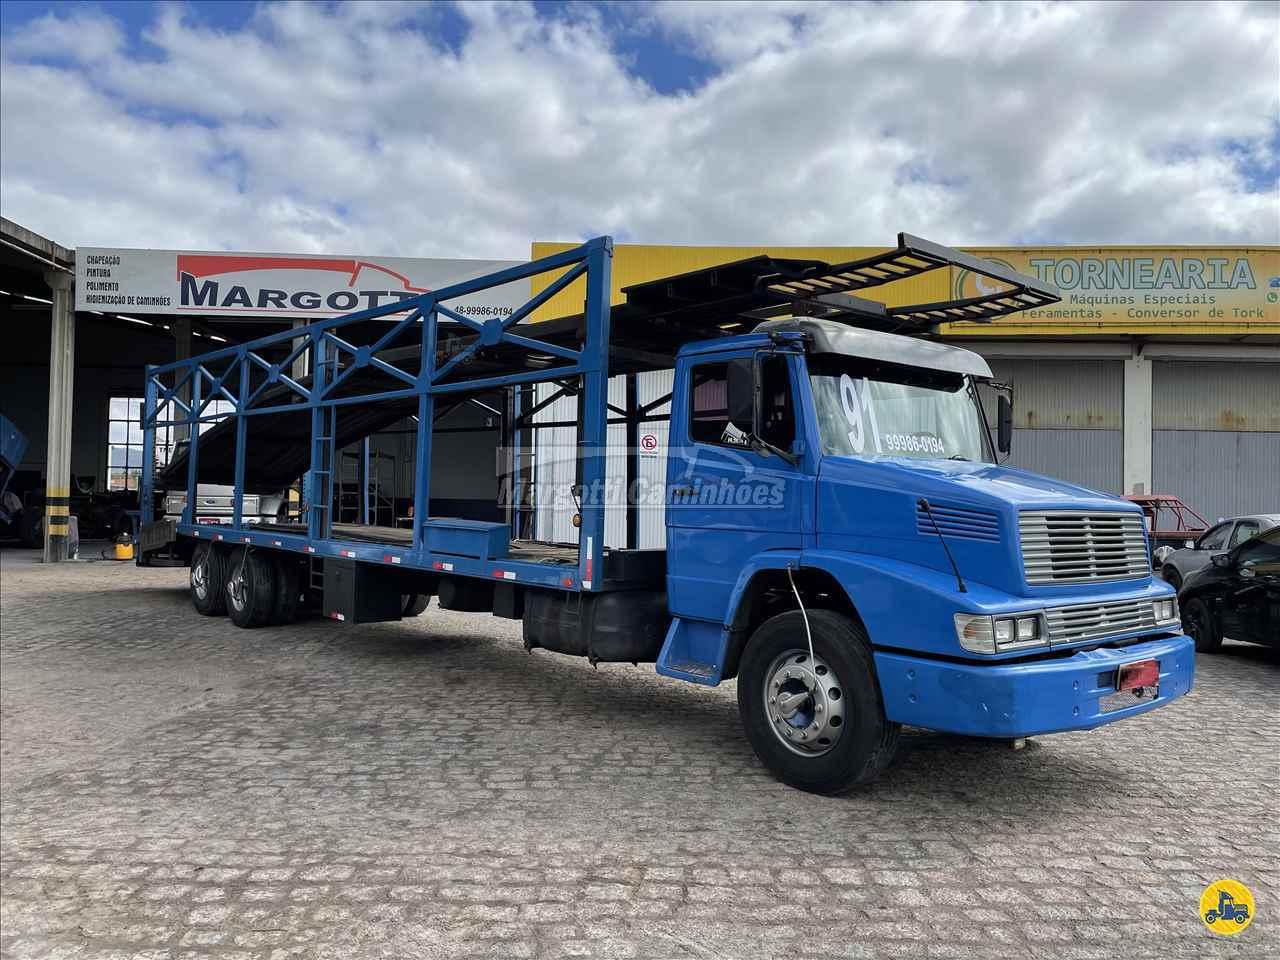 CAMINHAO MERCEDES-BENZ MB 1418 Cegonha Truck 6x2 Margotti Caminhões TUBARAO SANTA CATARINA SC